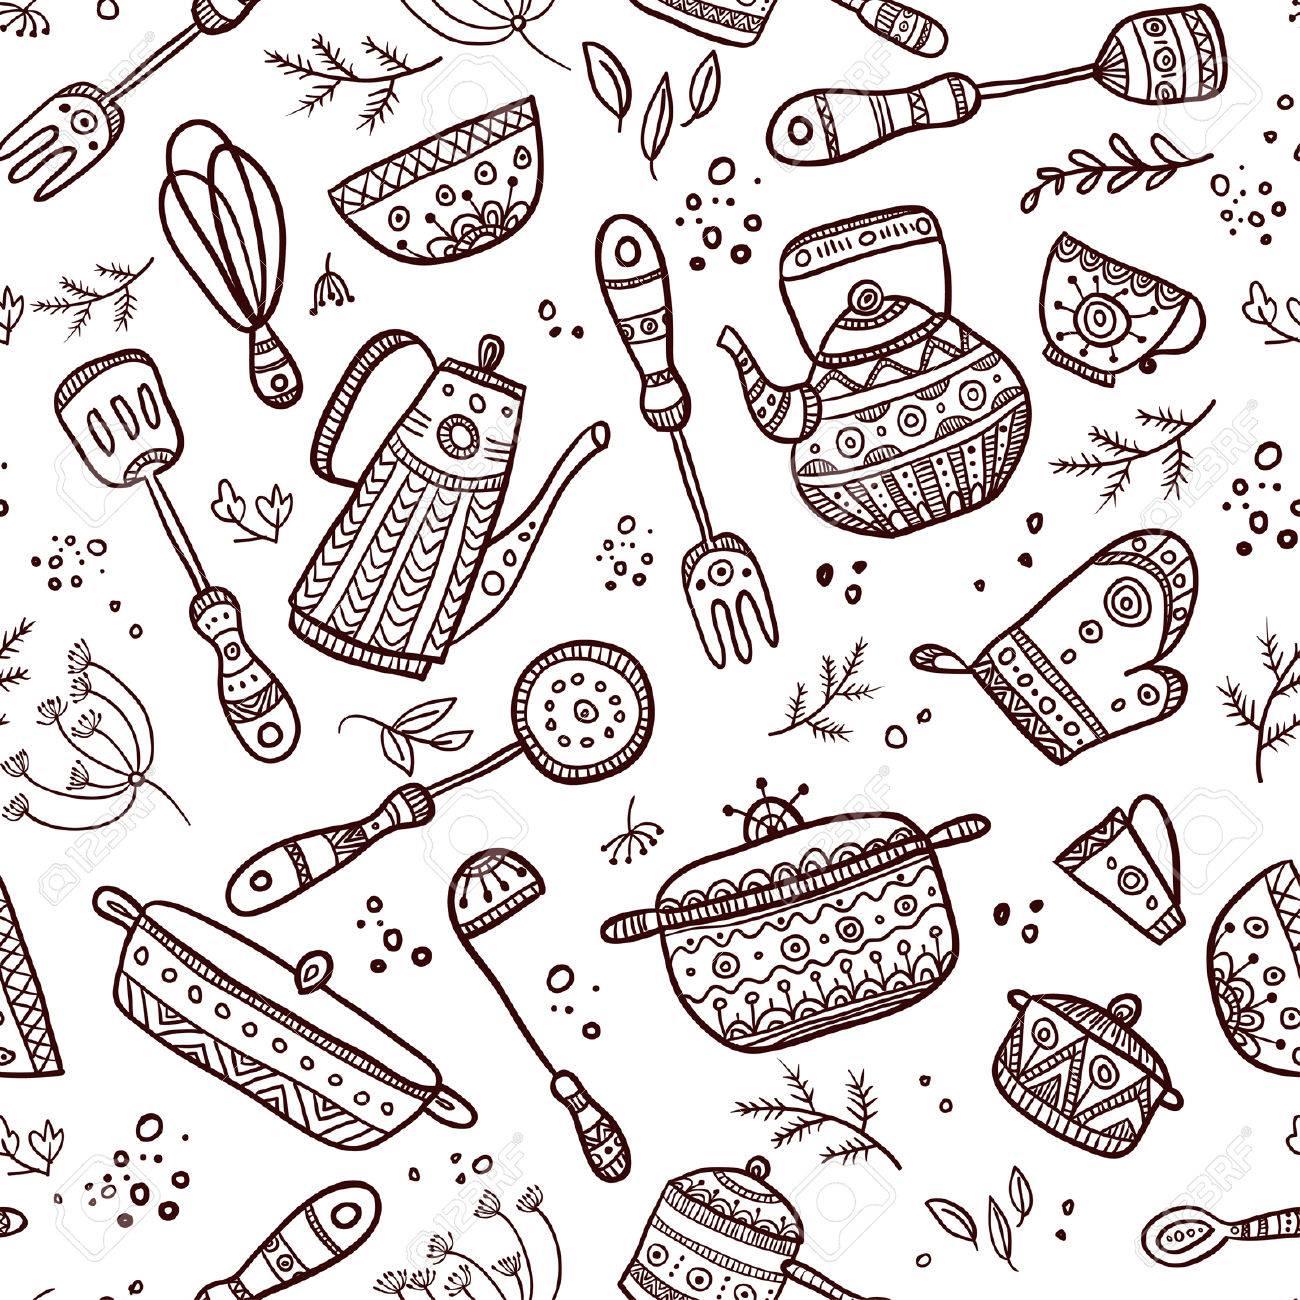 Italian Cuisine Wallpaper With Tasty Pasta Free Psd File